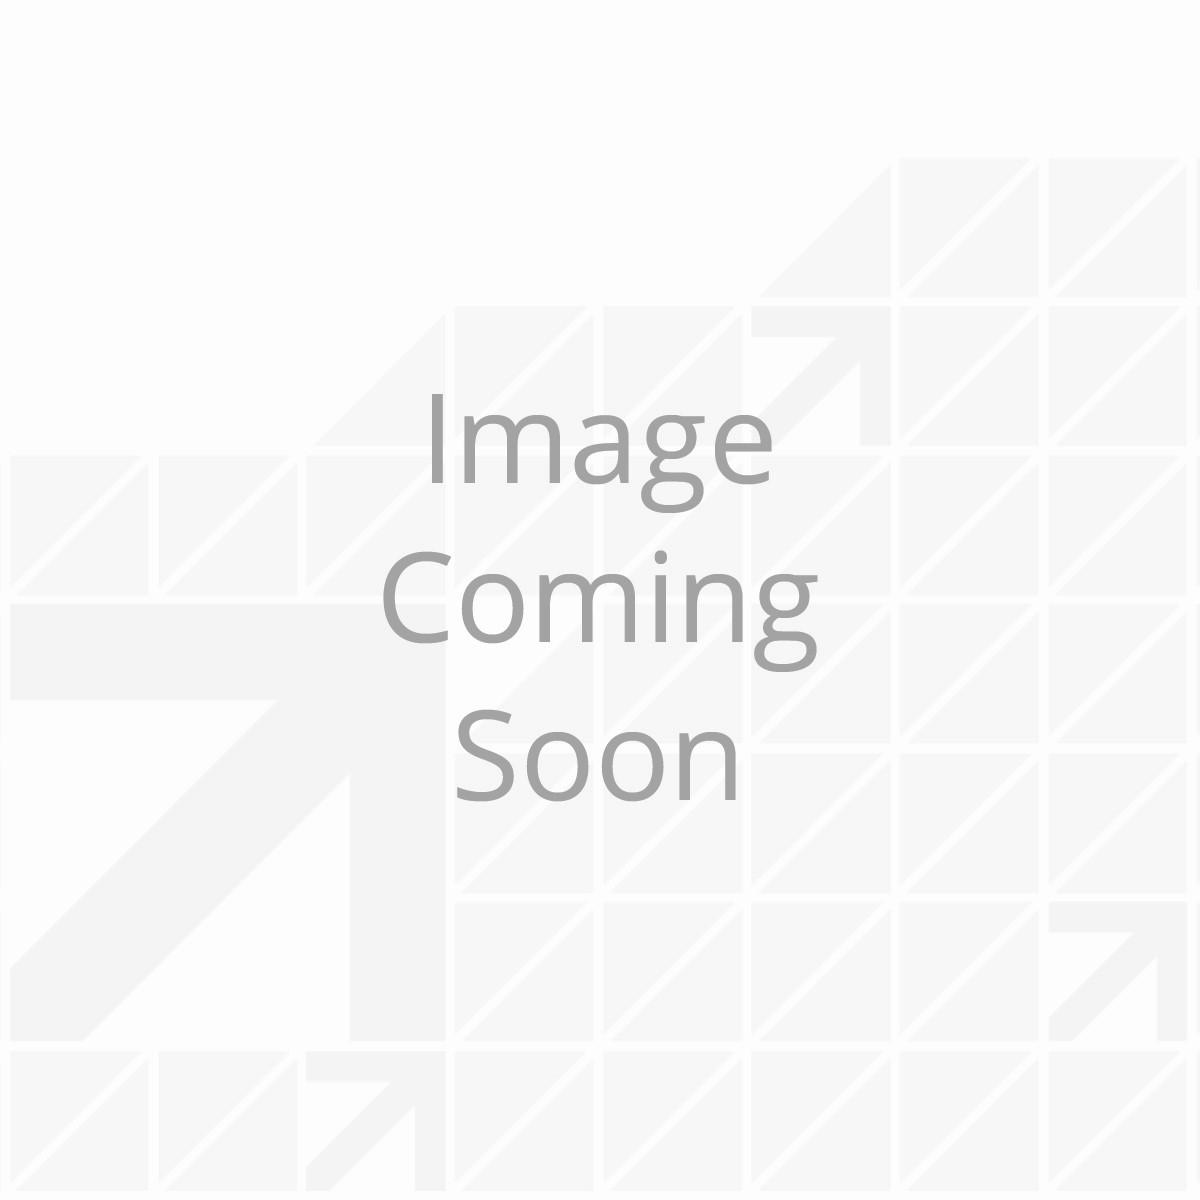 279689_-_equa_flex_kit_-_001_1